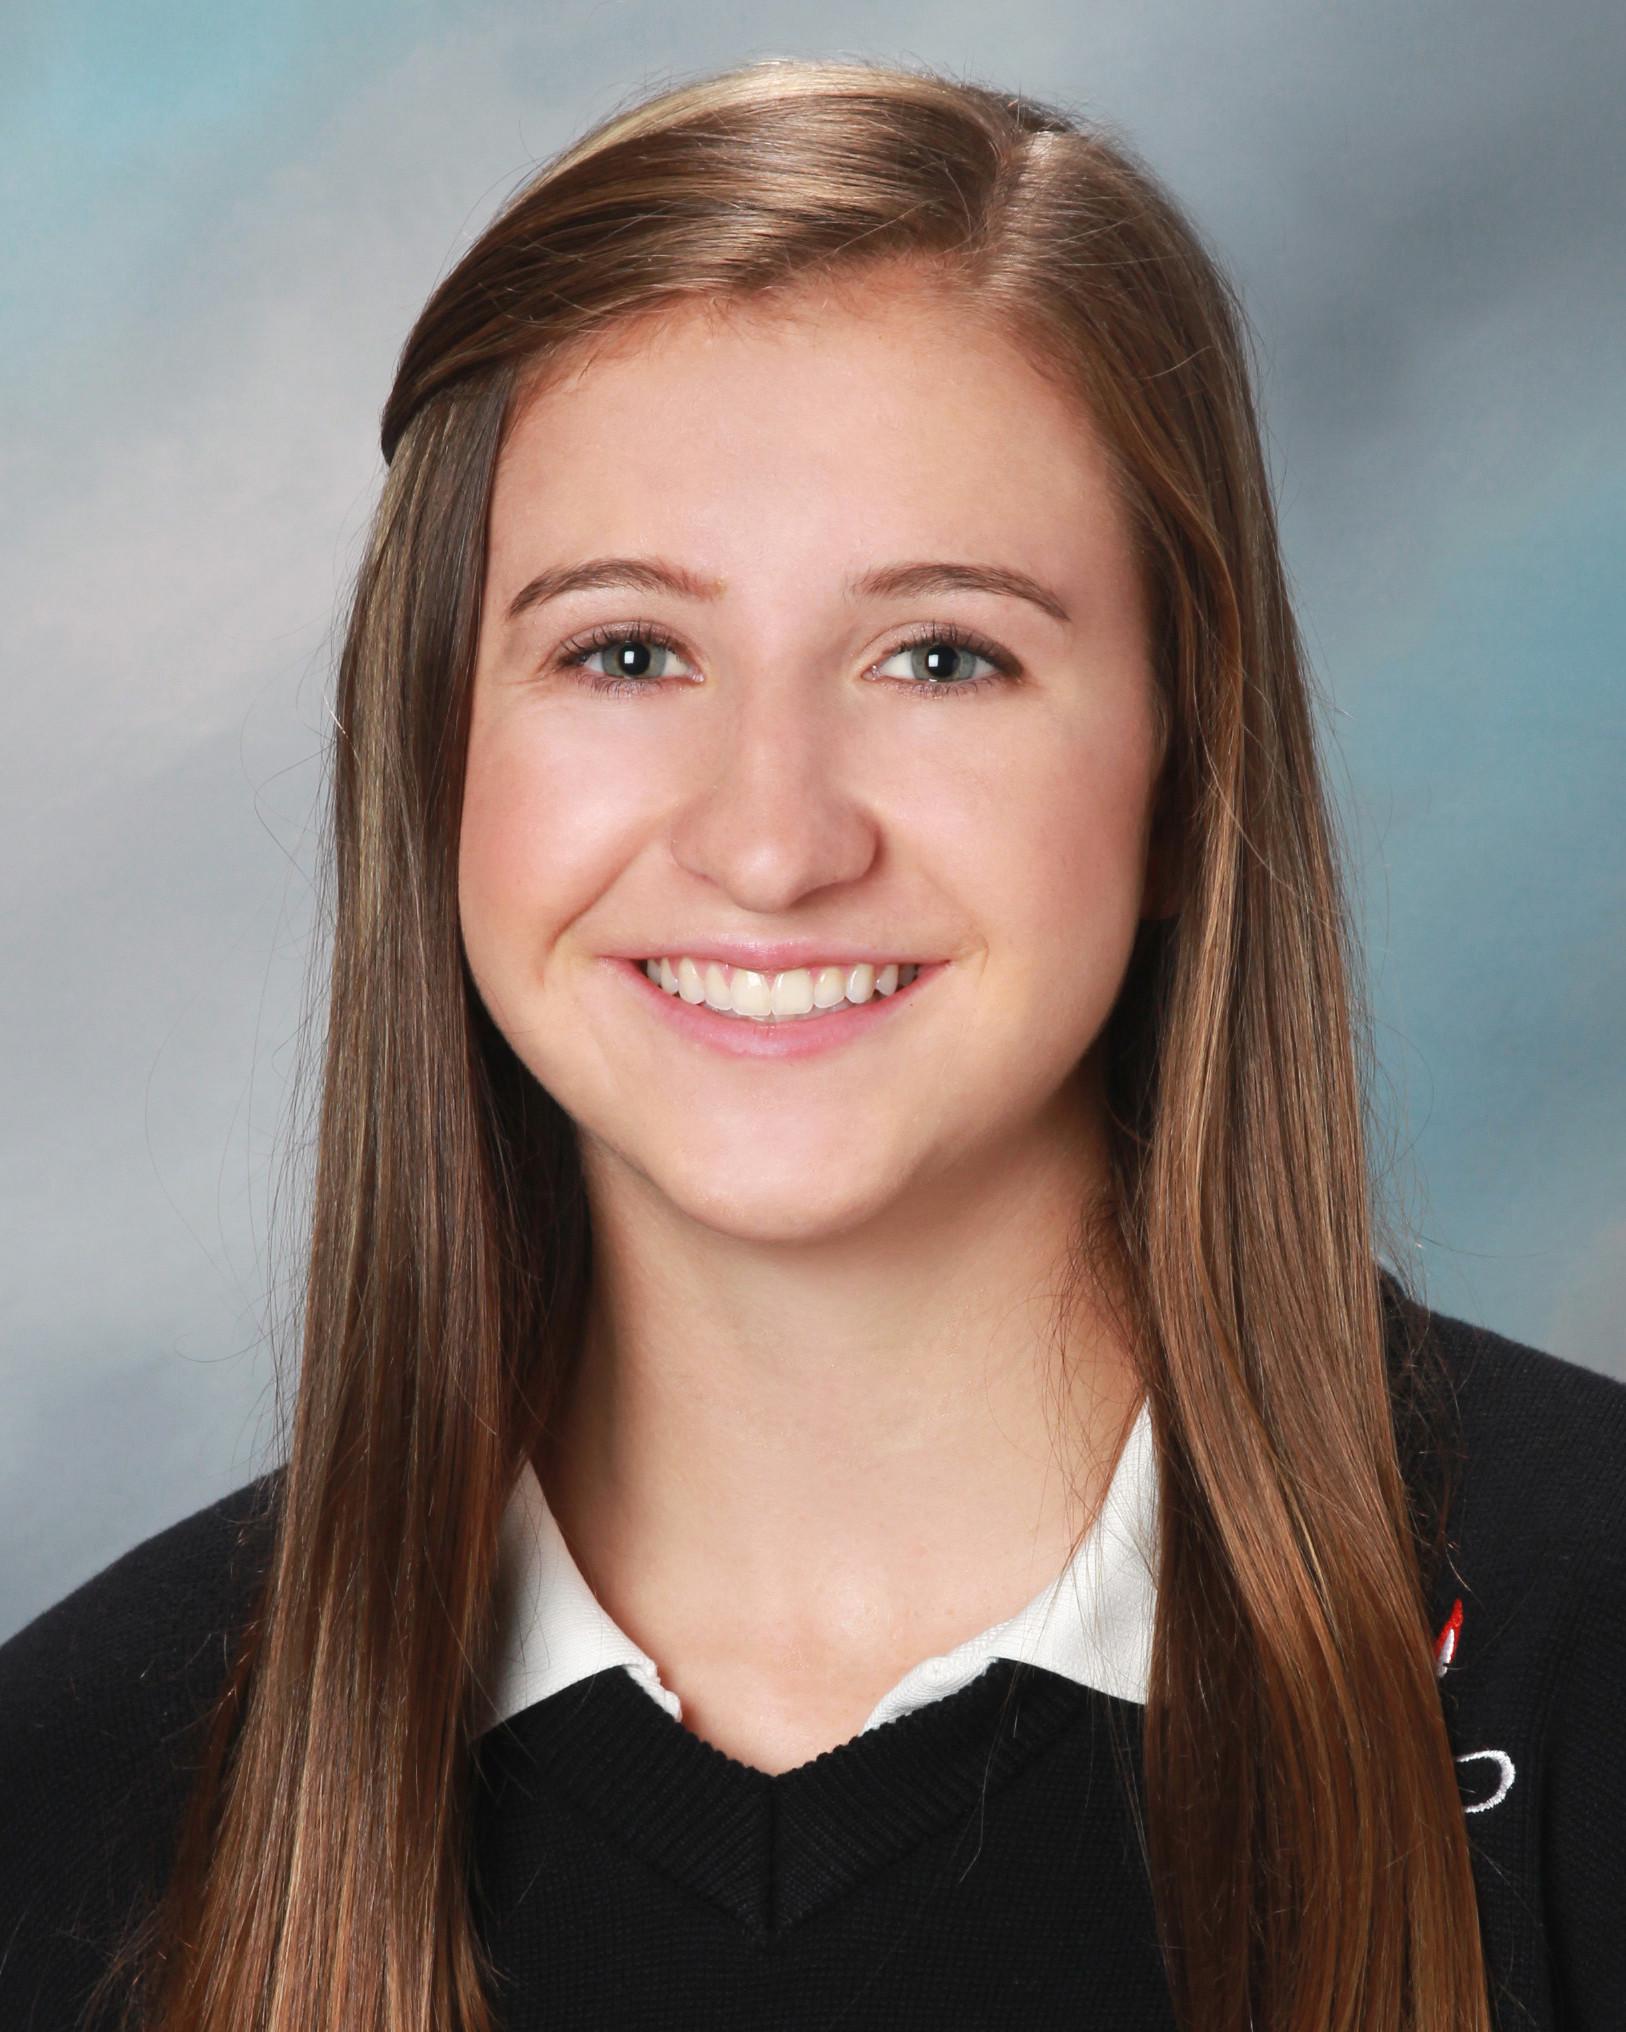 Ashlin Healy, Our Lady of Peace high school girls soccer